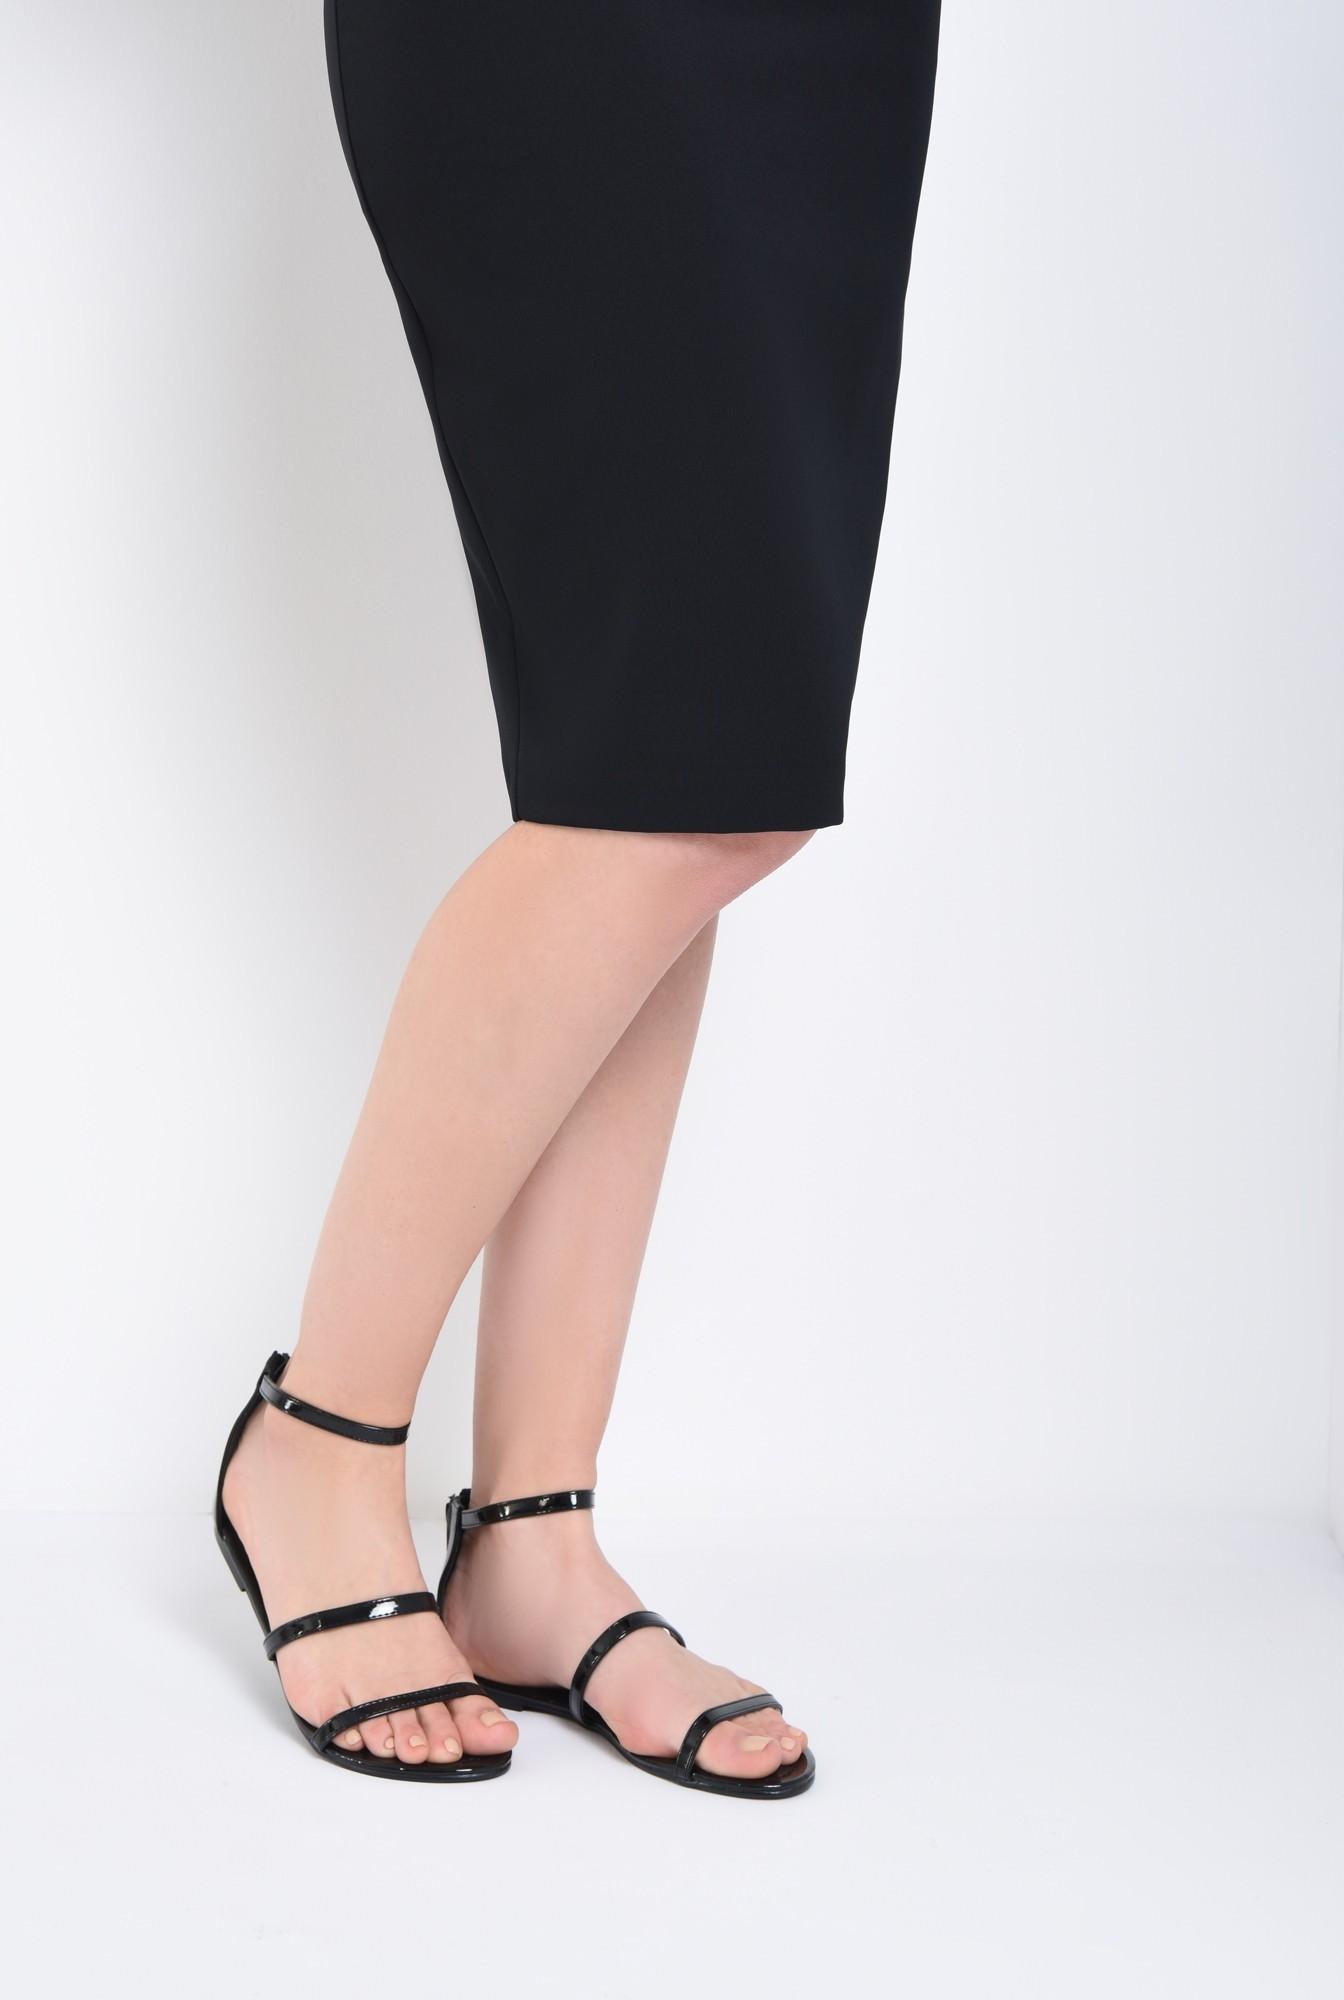 4 - sandale casual, cu talpa joasa, barete subtiri